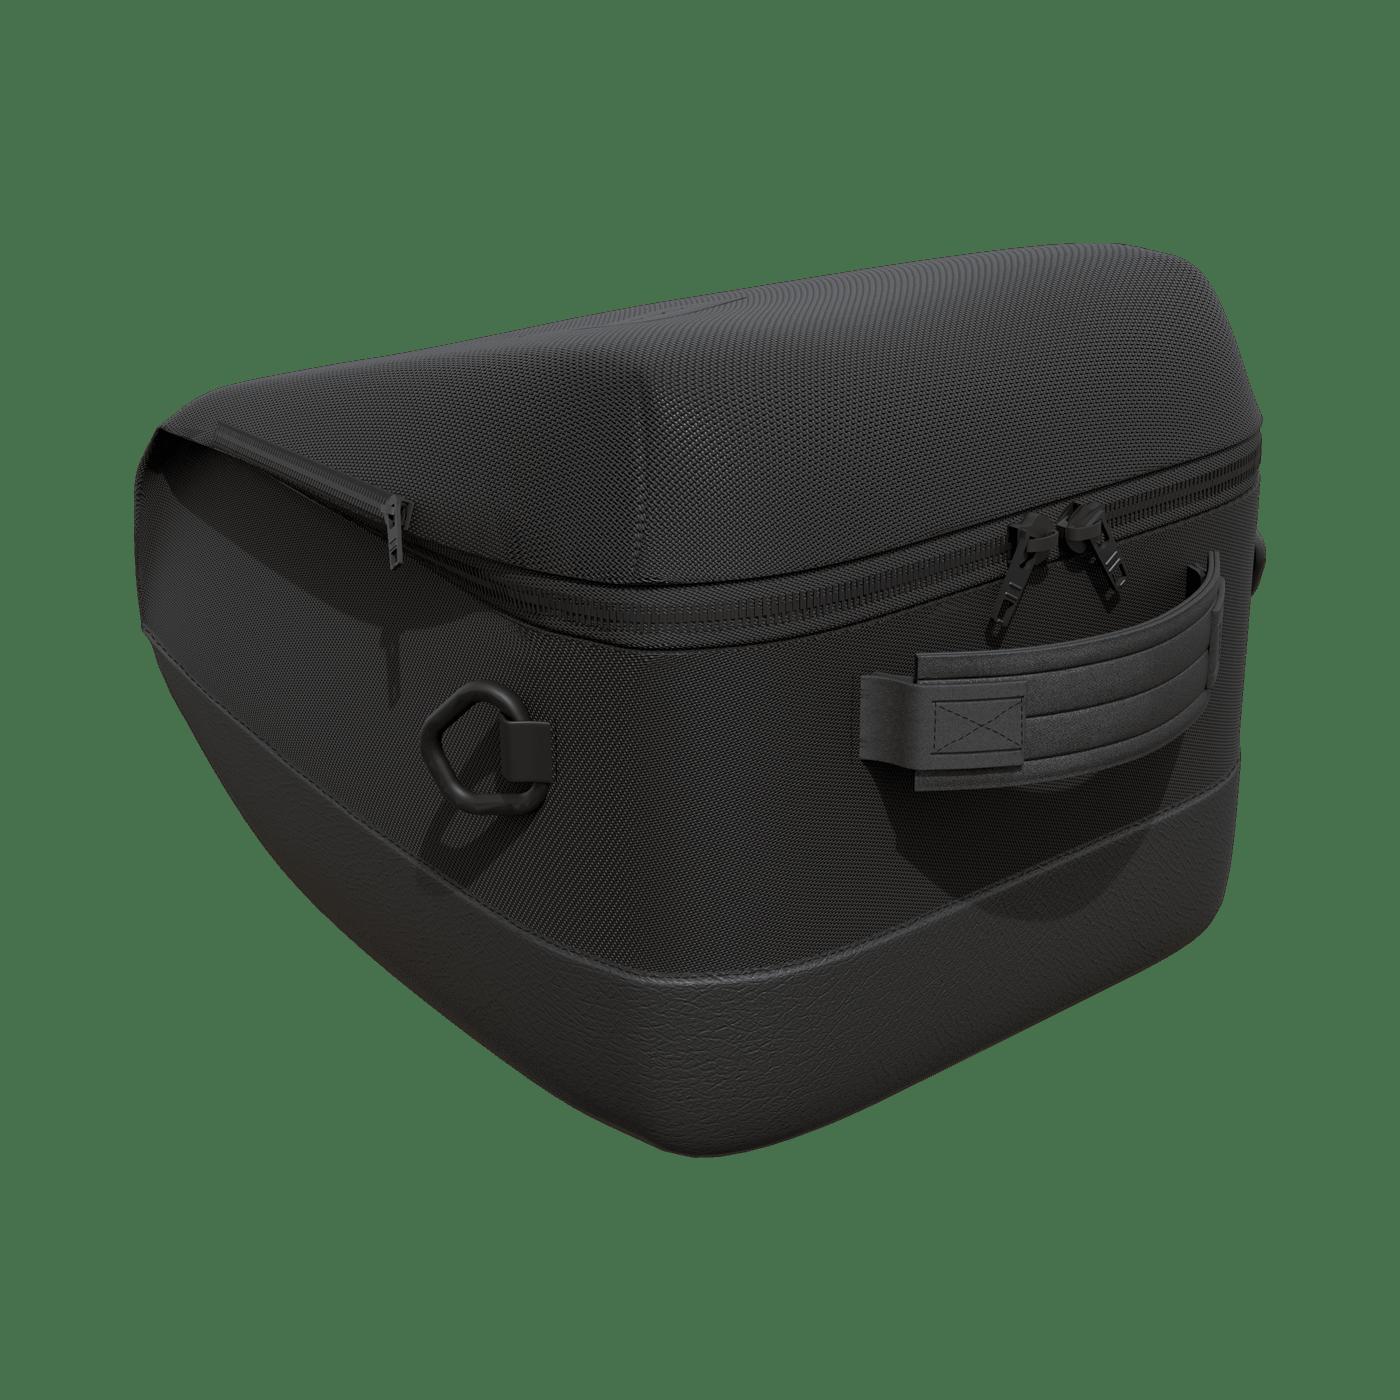 horse riding helmet bag in black leather